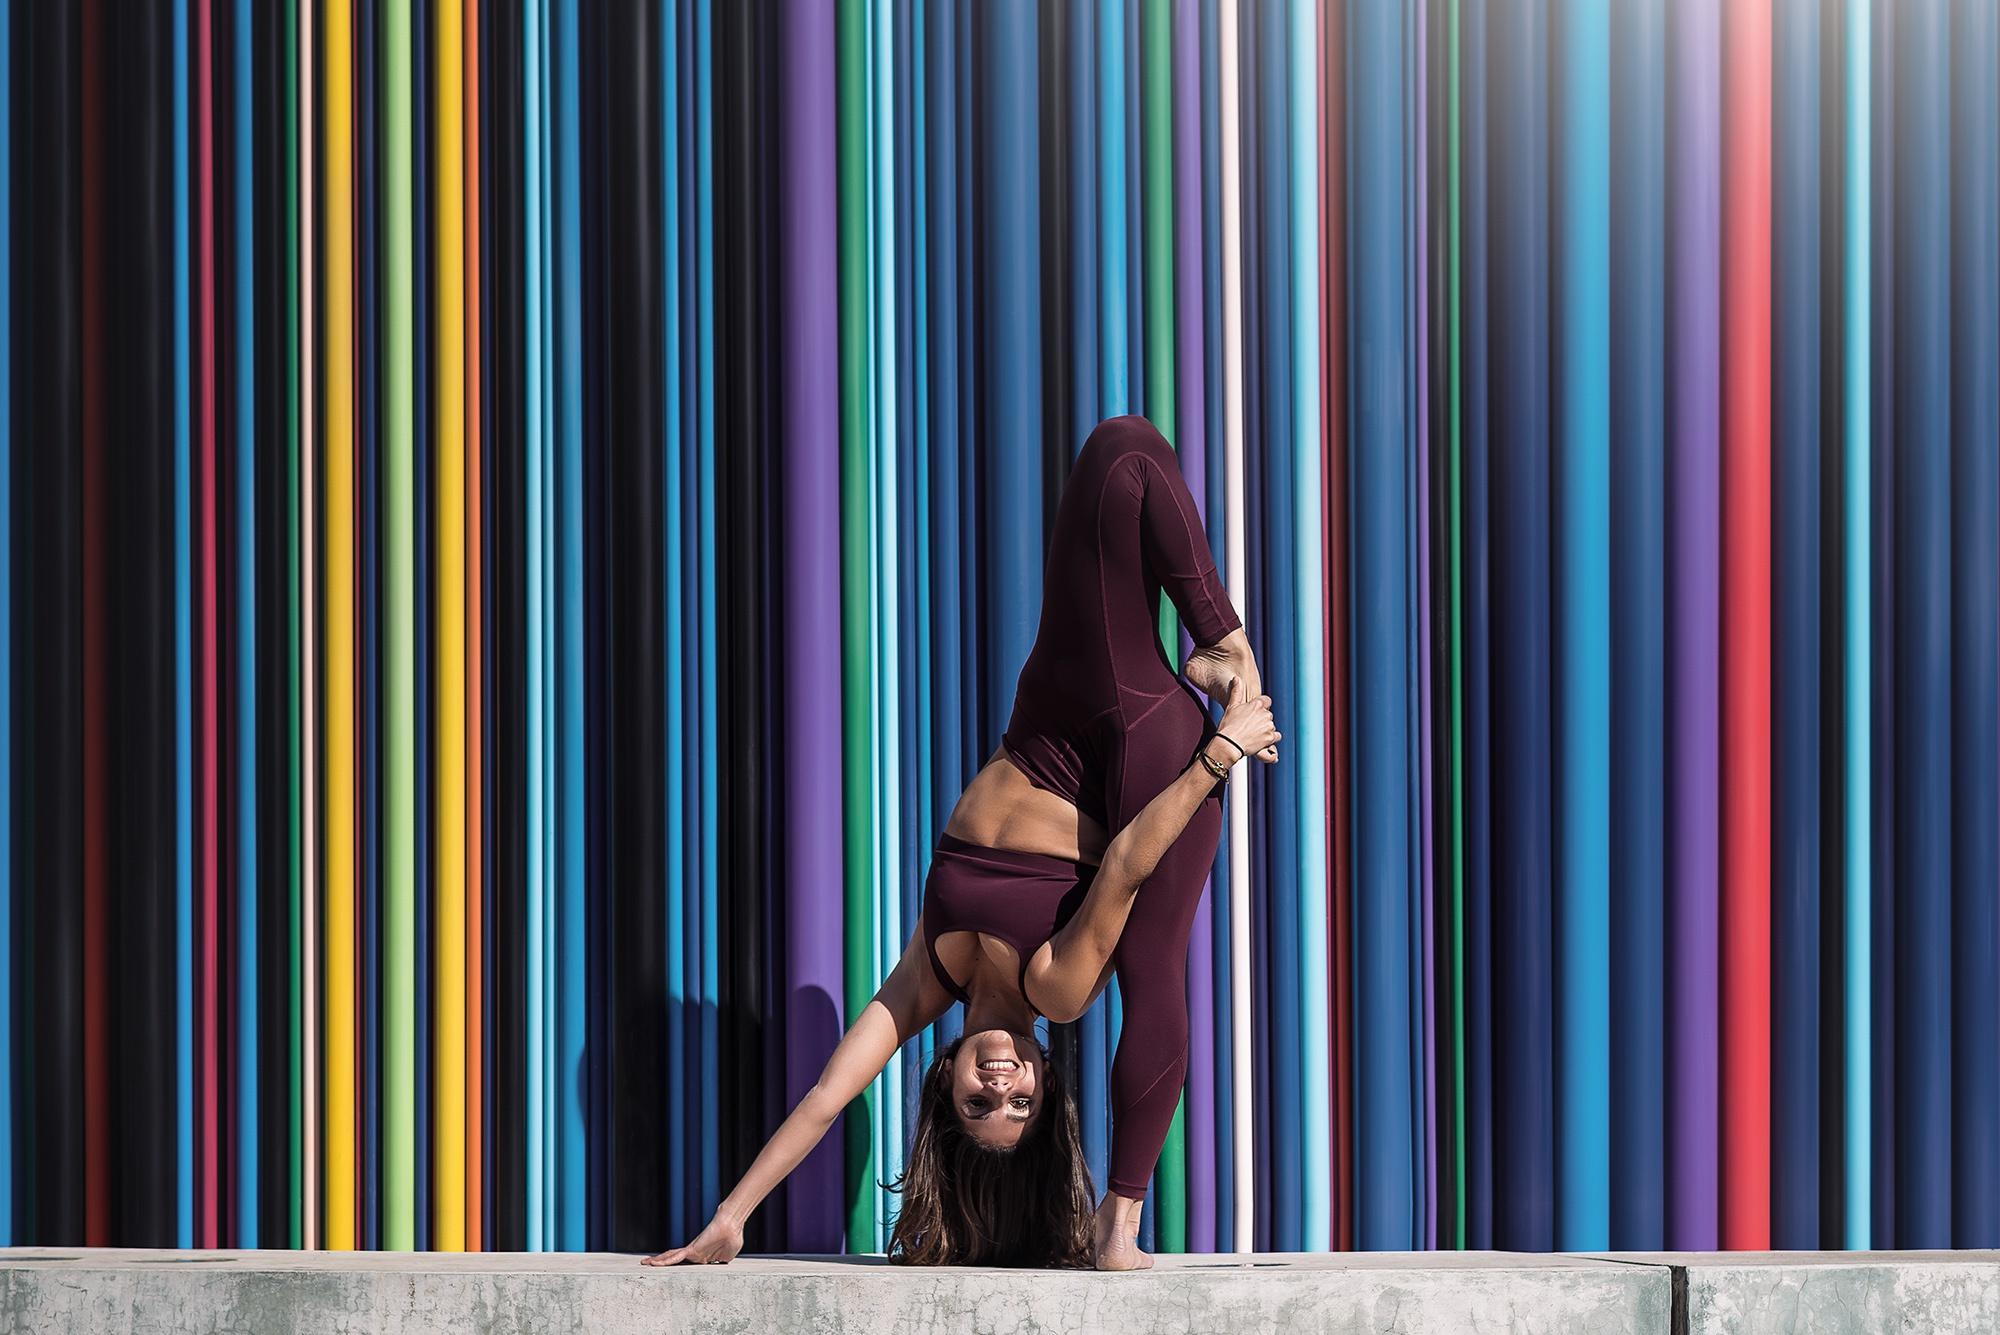 headstand sports bra yoga pants women sport  colorful flexible